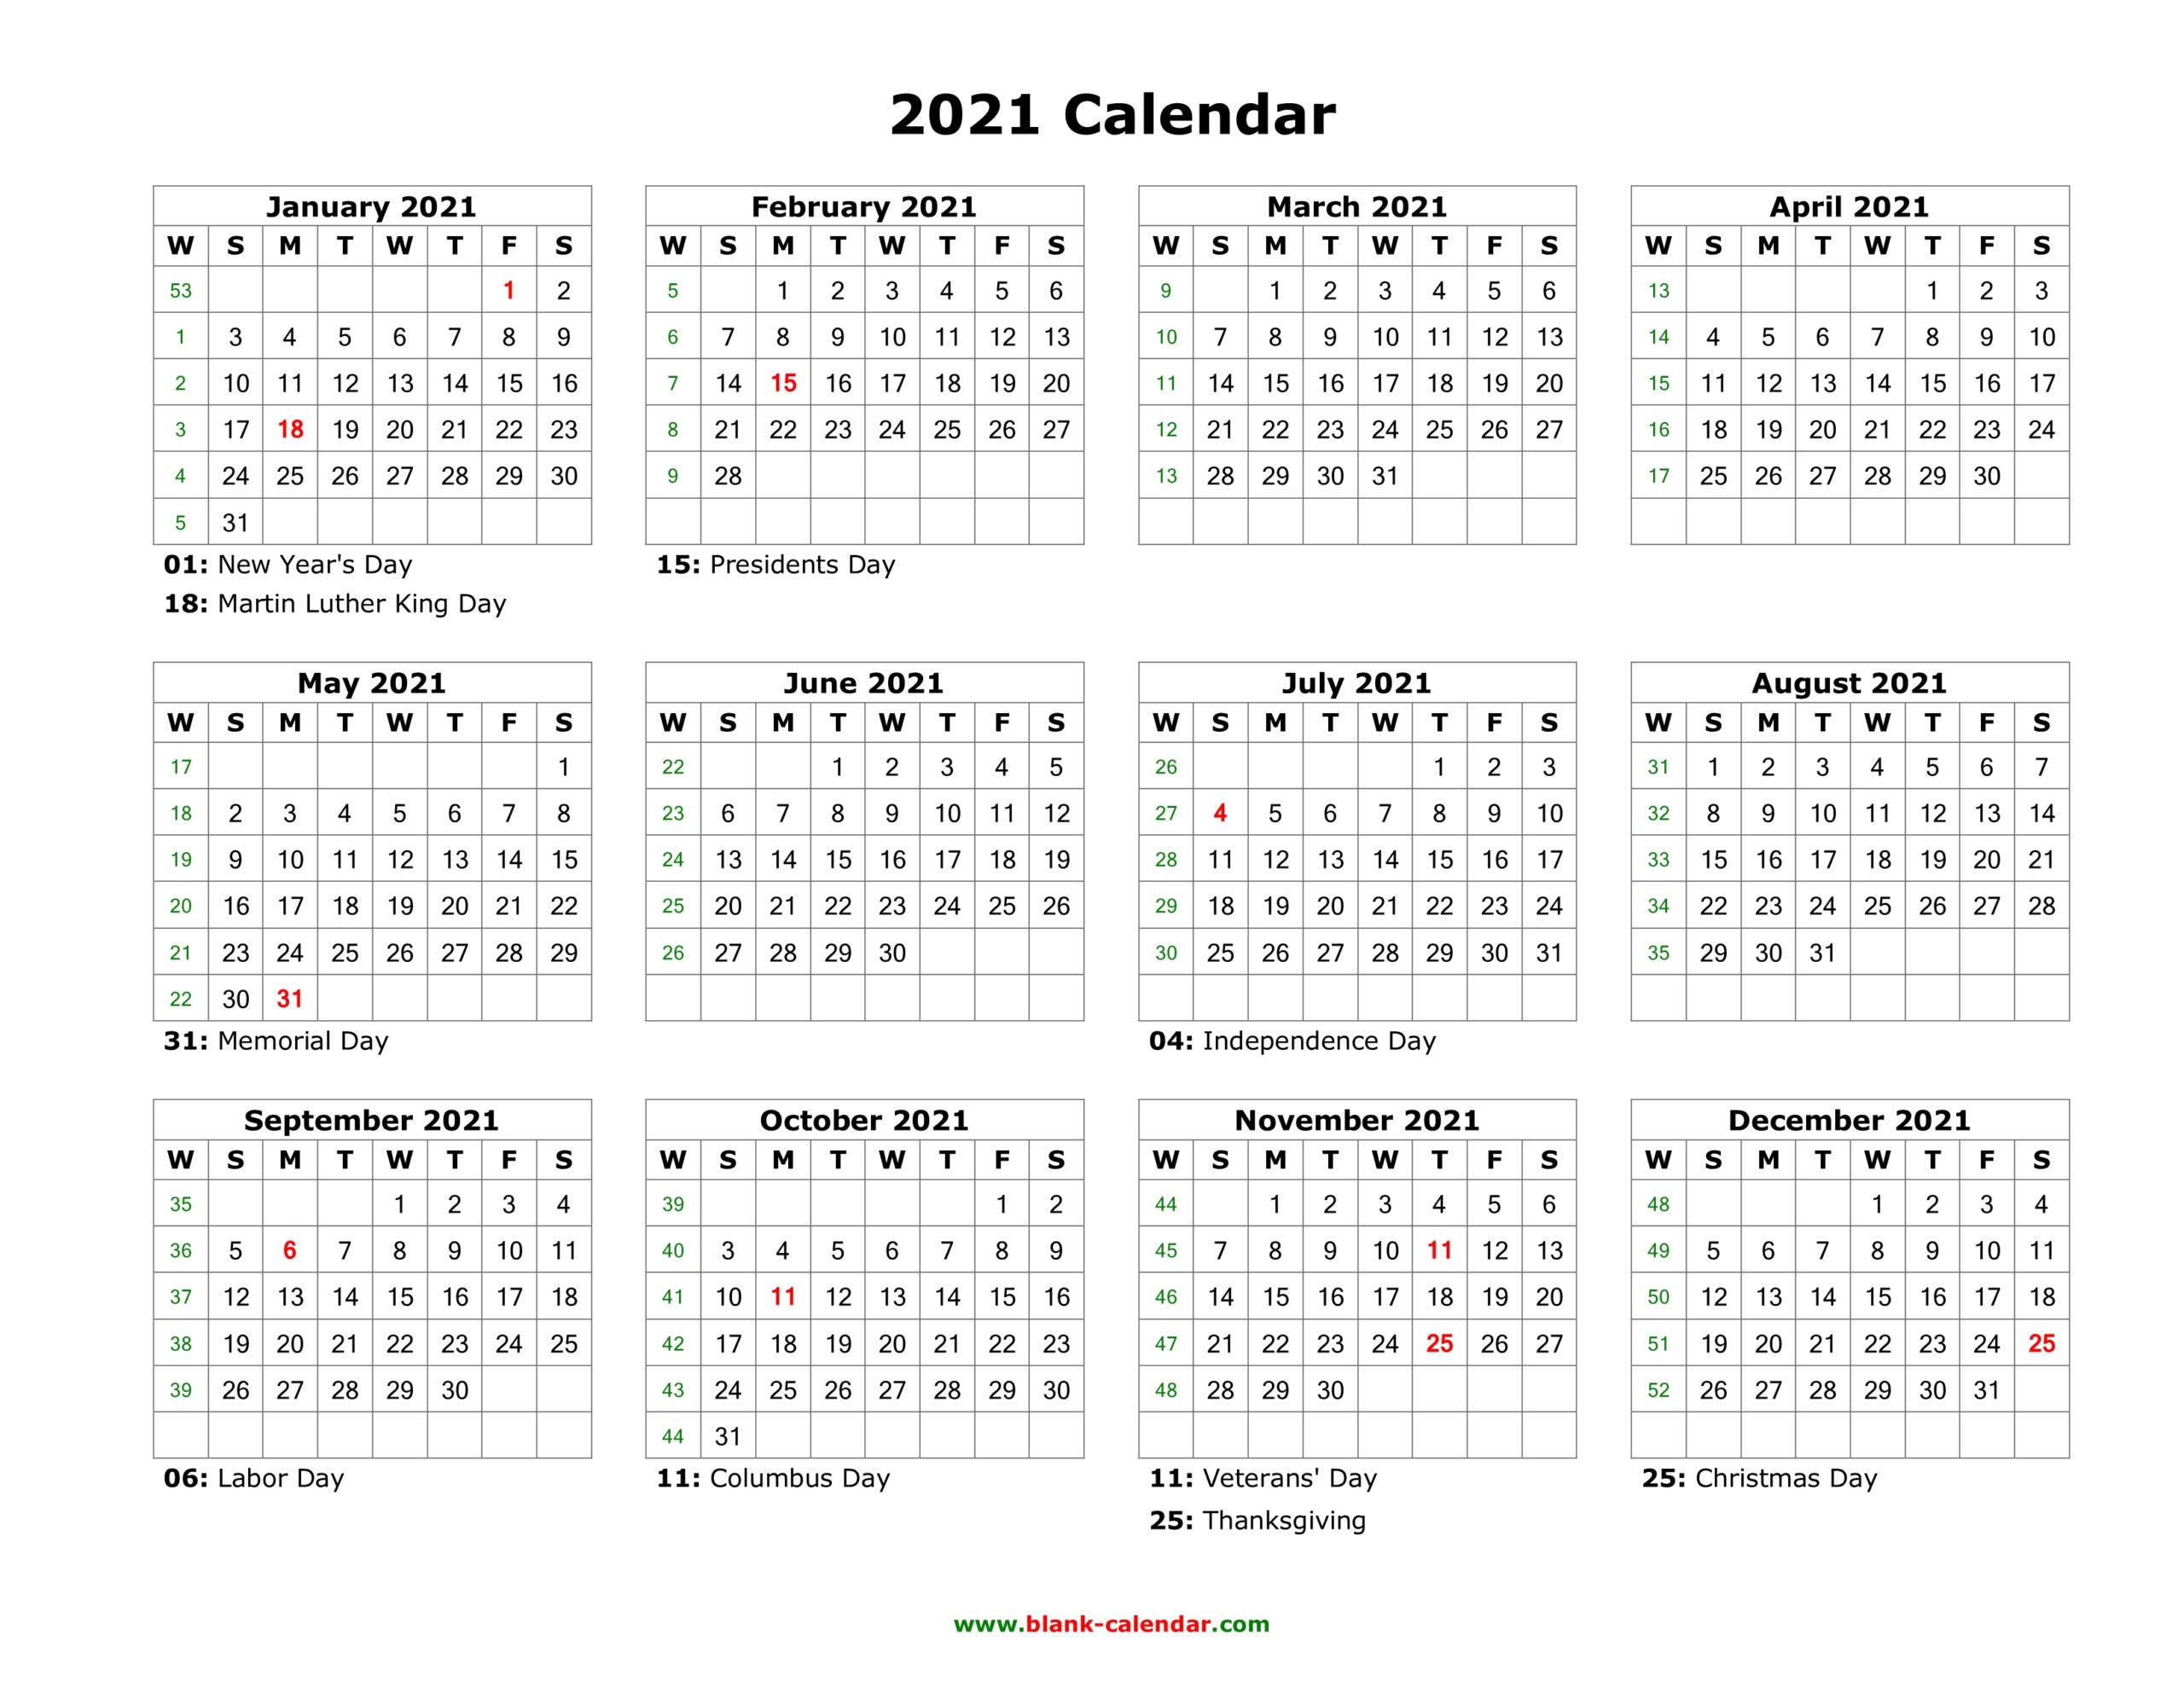 Blank Calendar 2021 | Free Download Calendar Templates throughout Fill In Calendar 2021 Printable